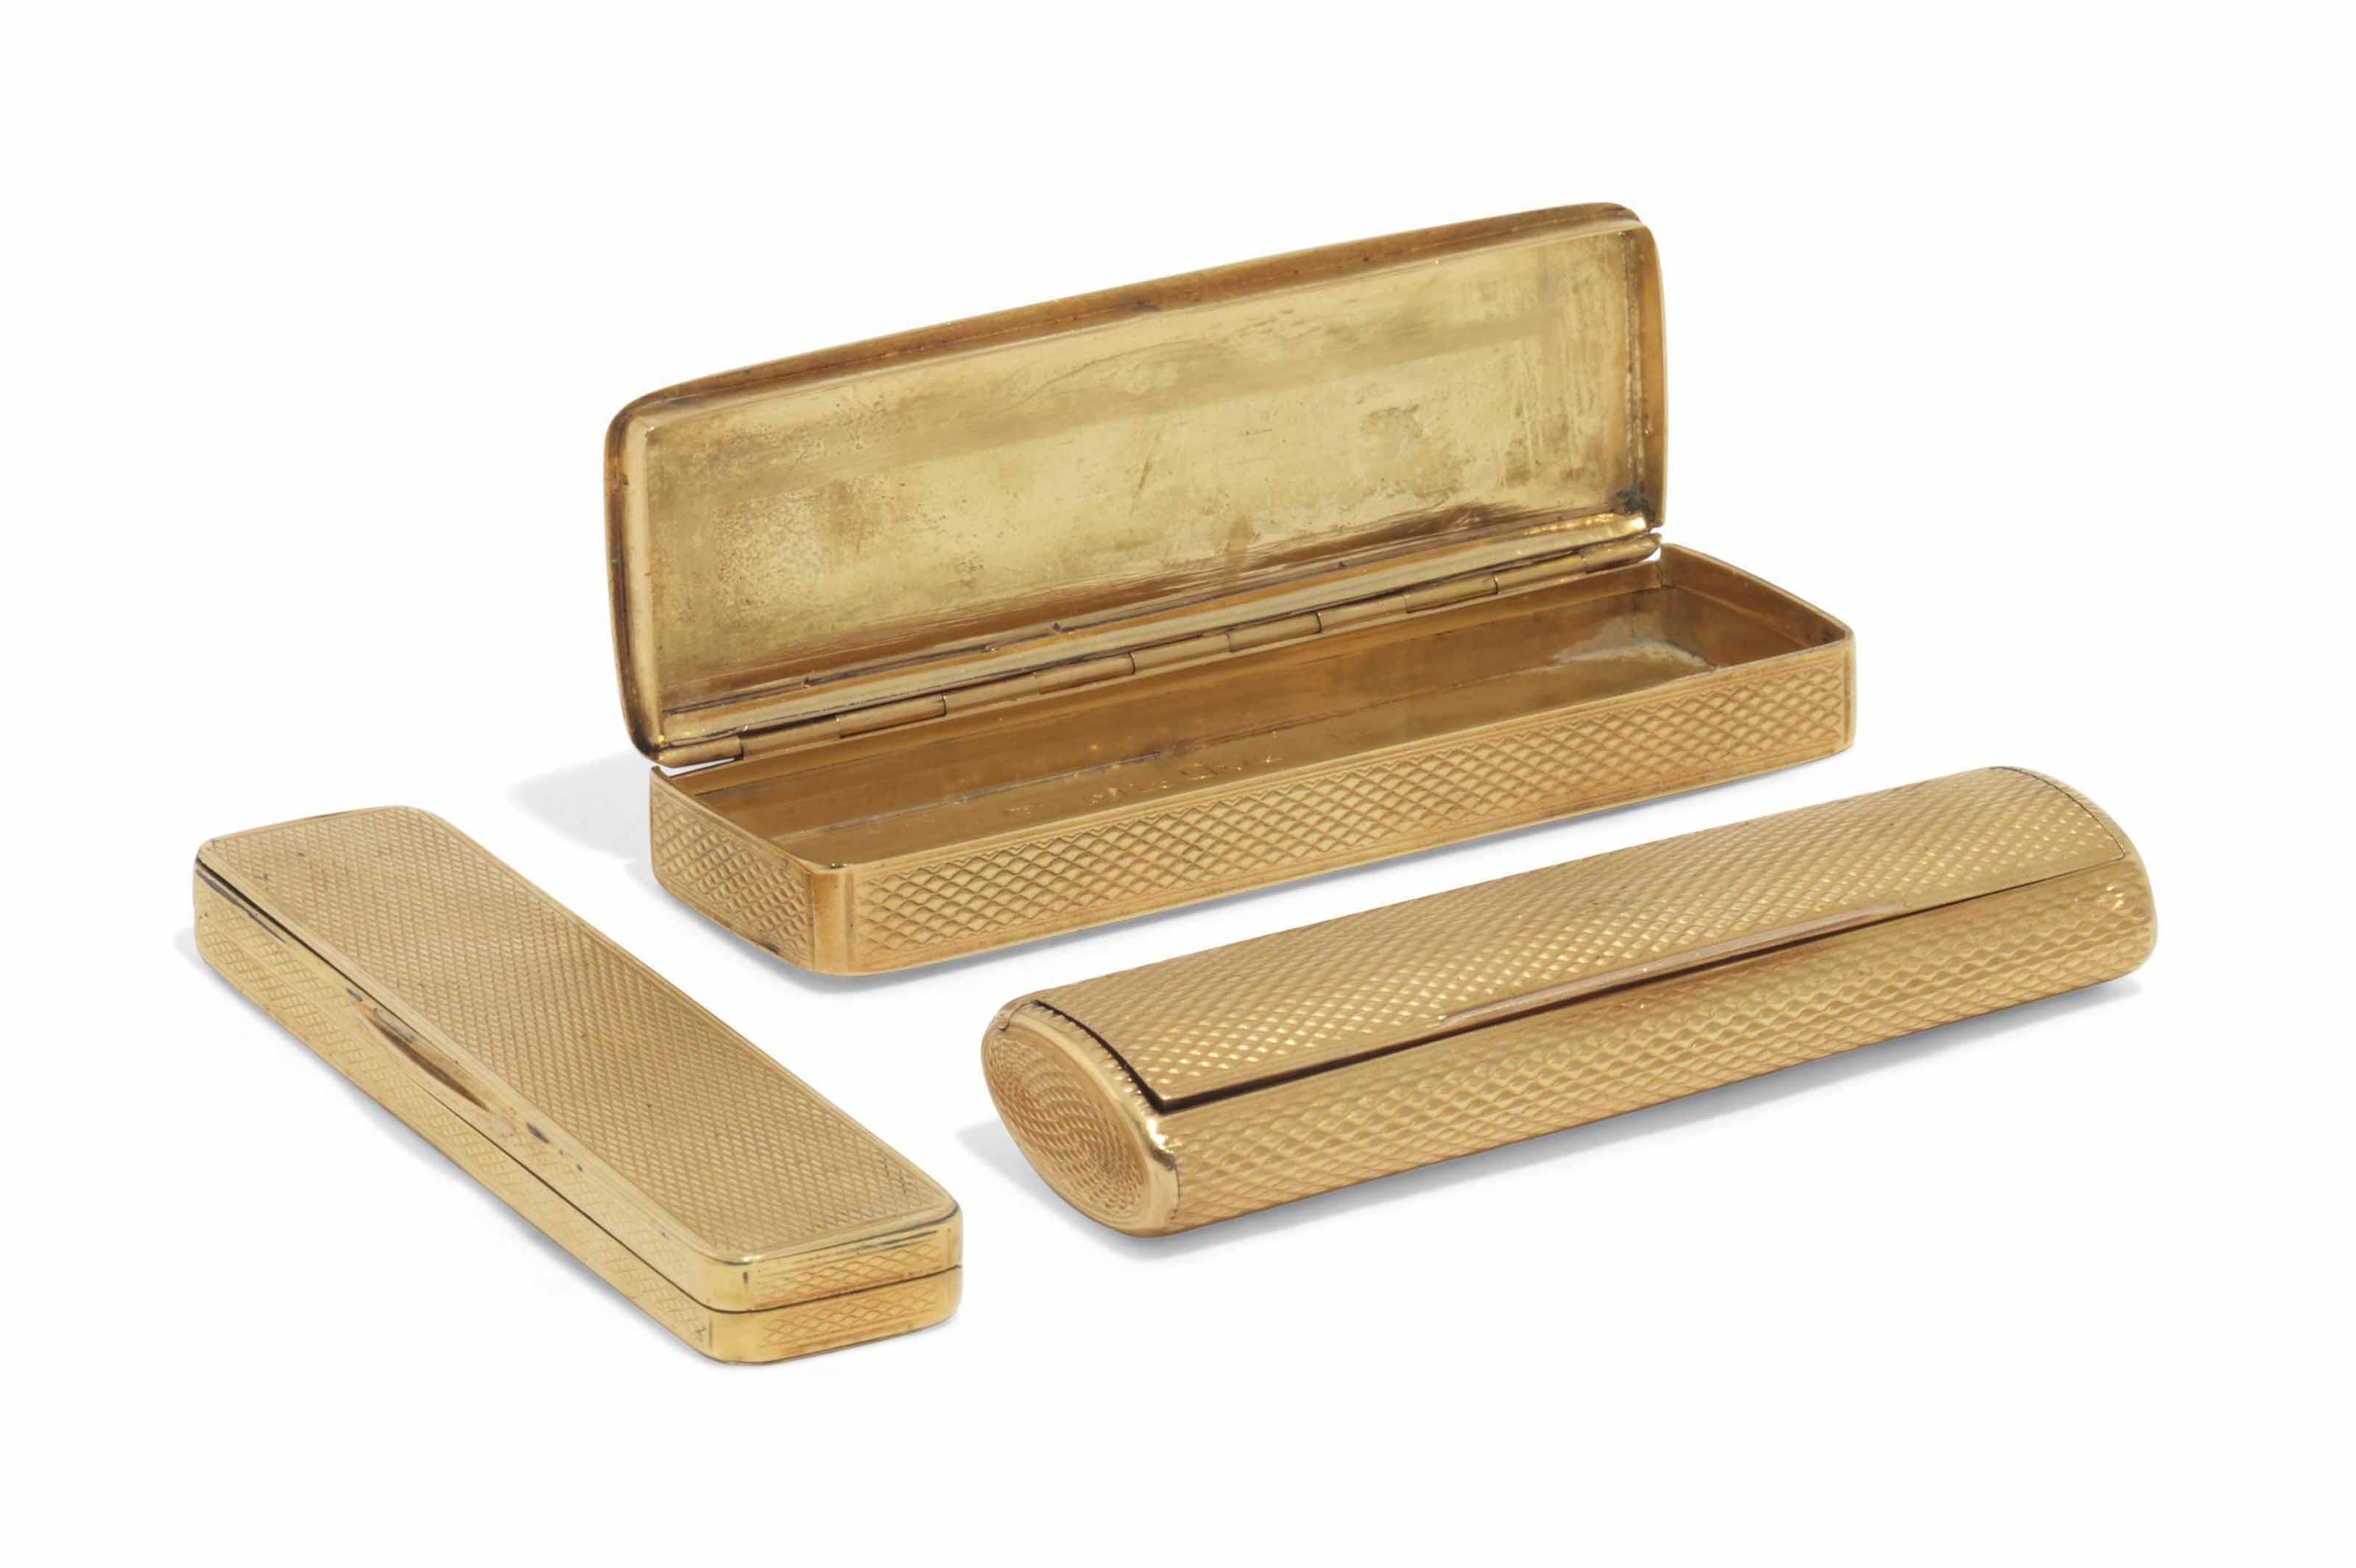 THREE 18 CARAT GOLD TOOTHPICK CASES